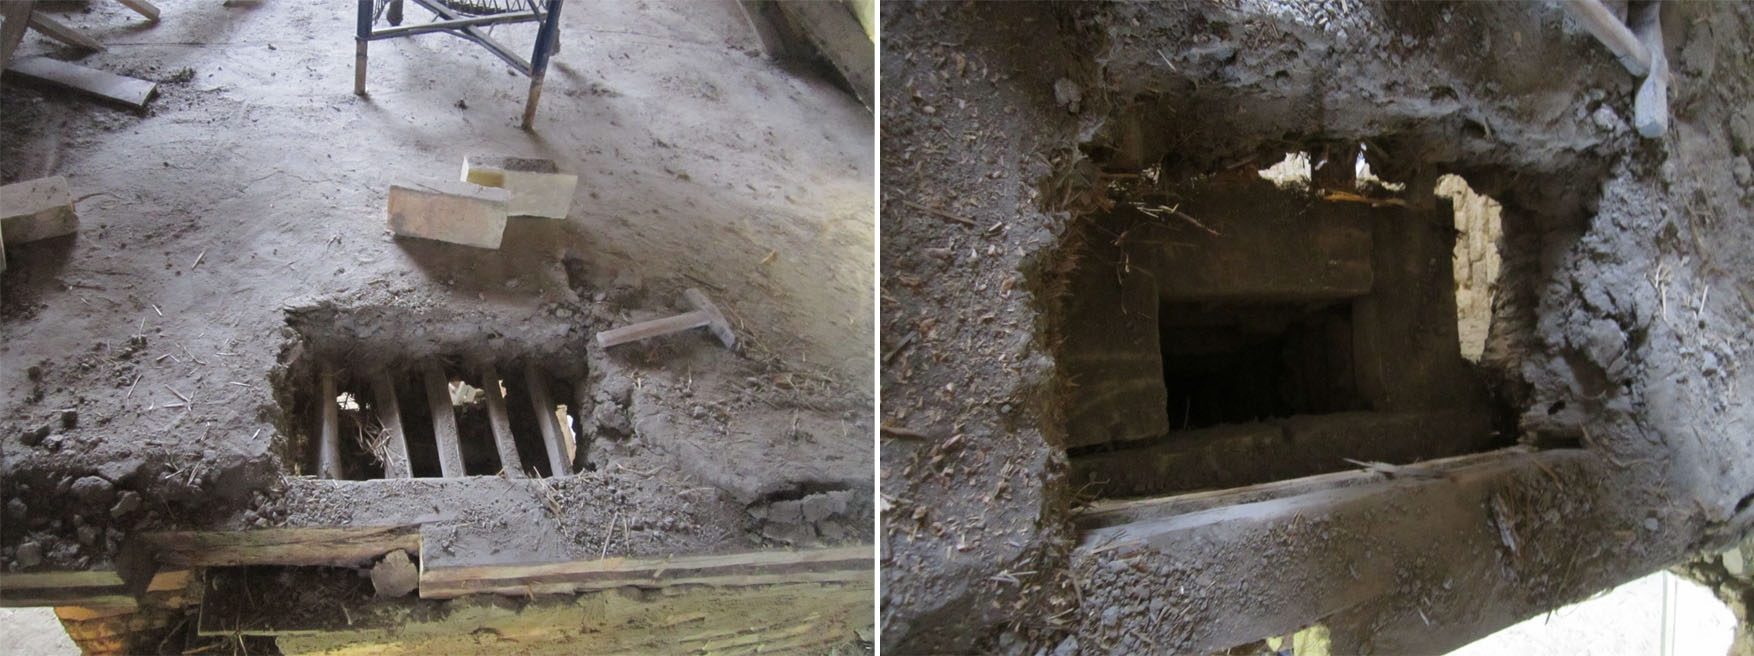 41 Mosorin prosta pec radionica zidanje odzaka  jun 2014